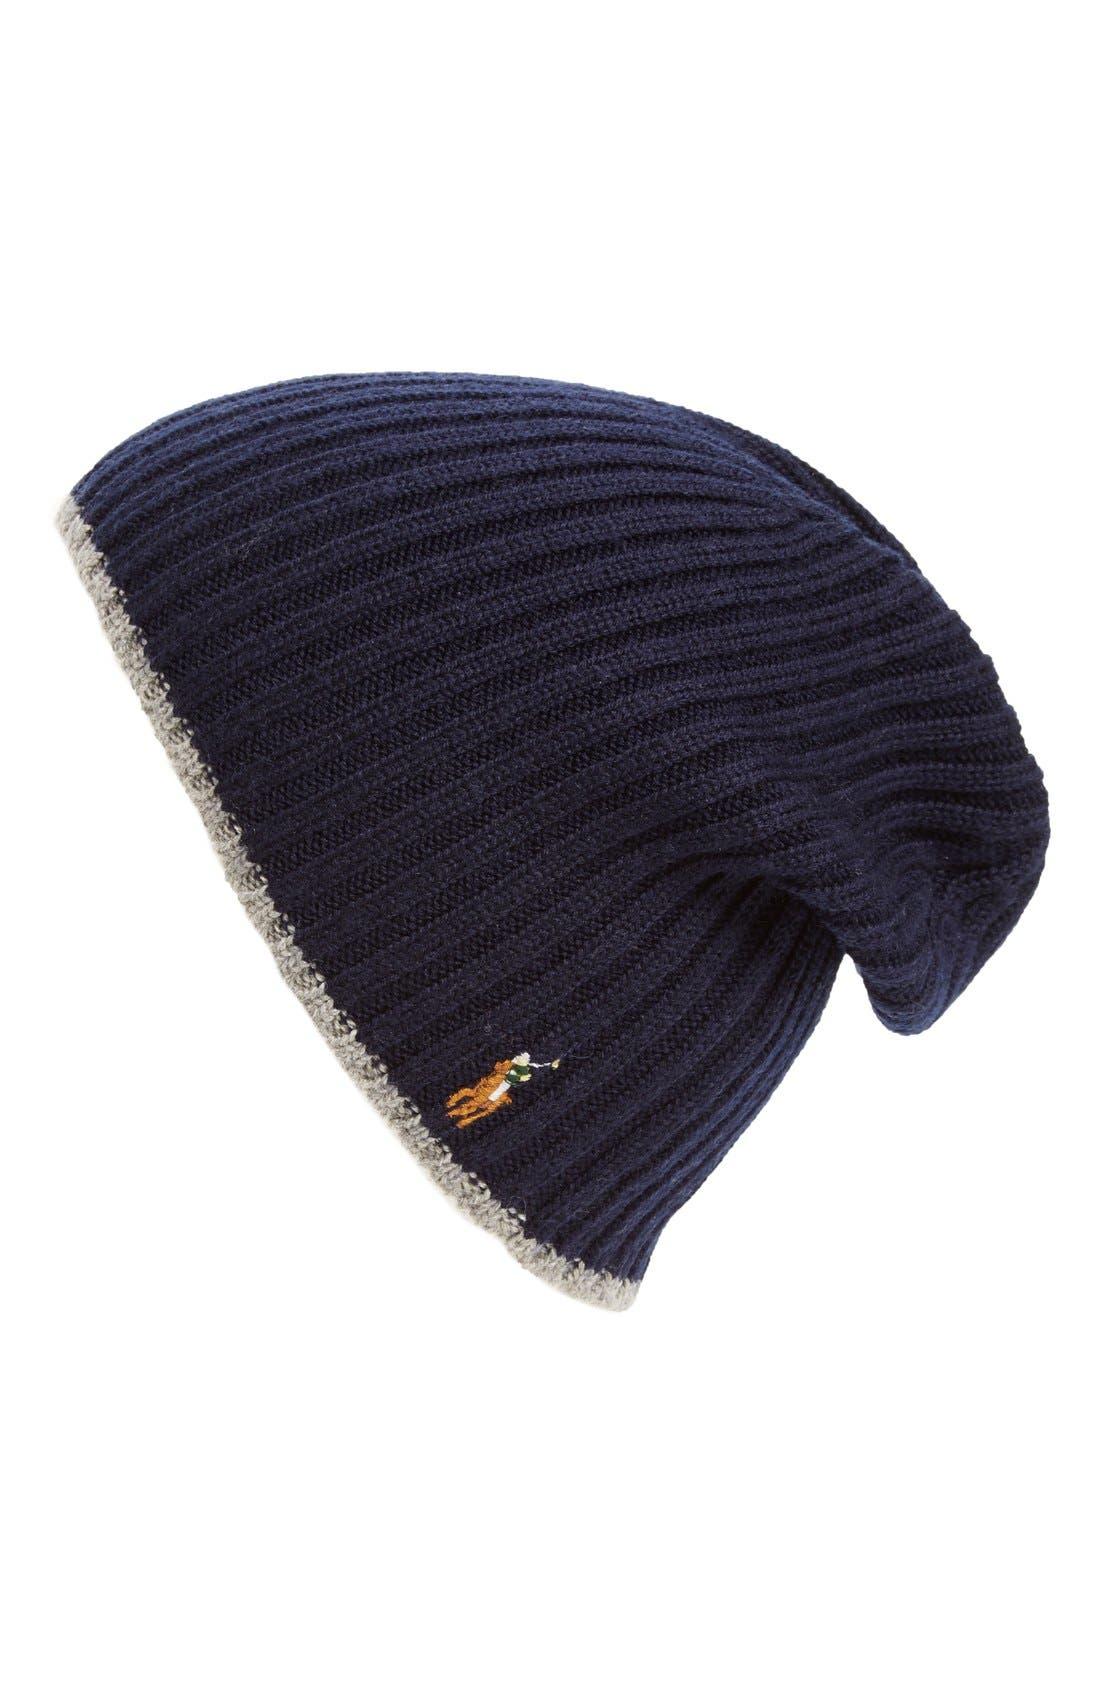 Alternate Image 1 Selected - Polo Ralph Lauren Classic Merino Wool Cap